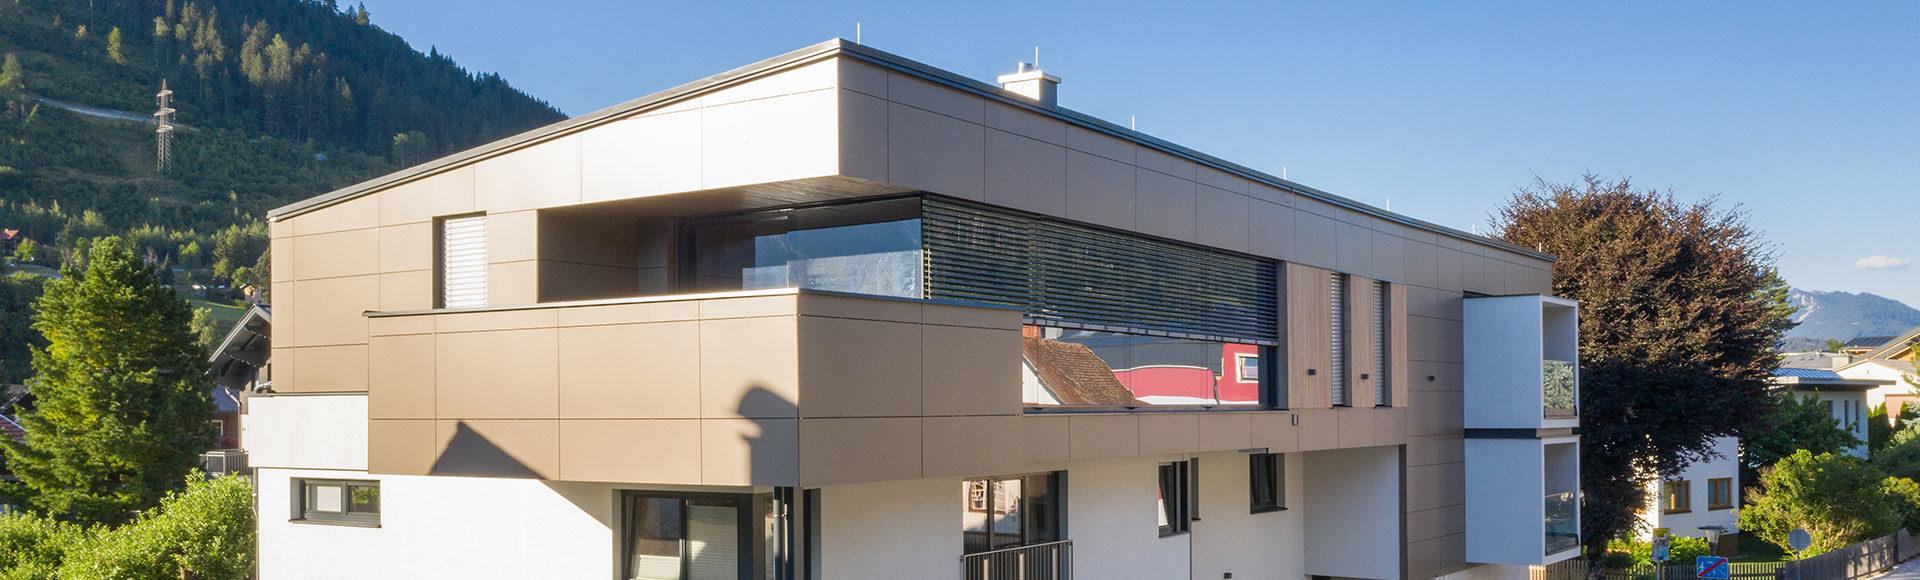 ImPuls aparts, Appartements in Schladming